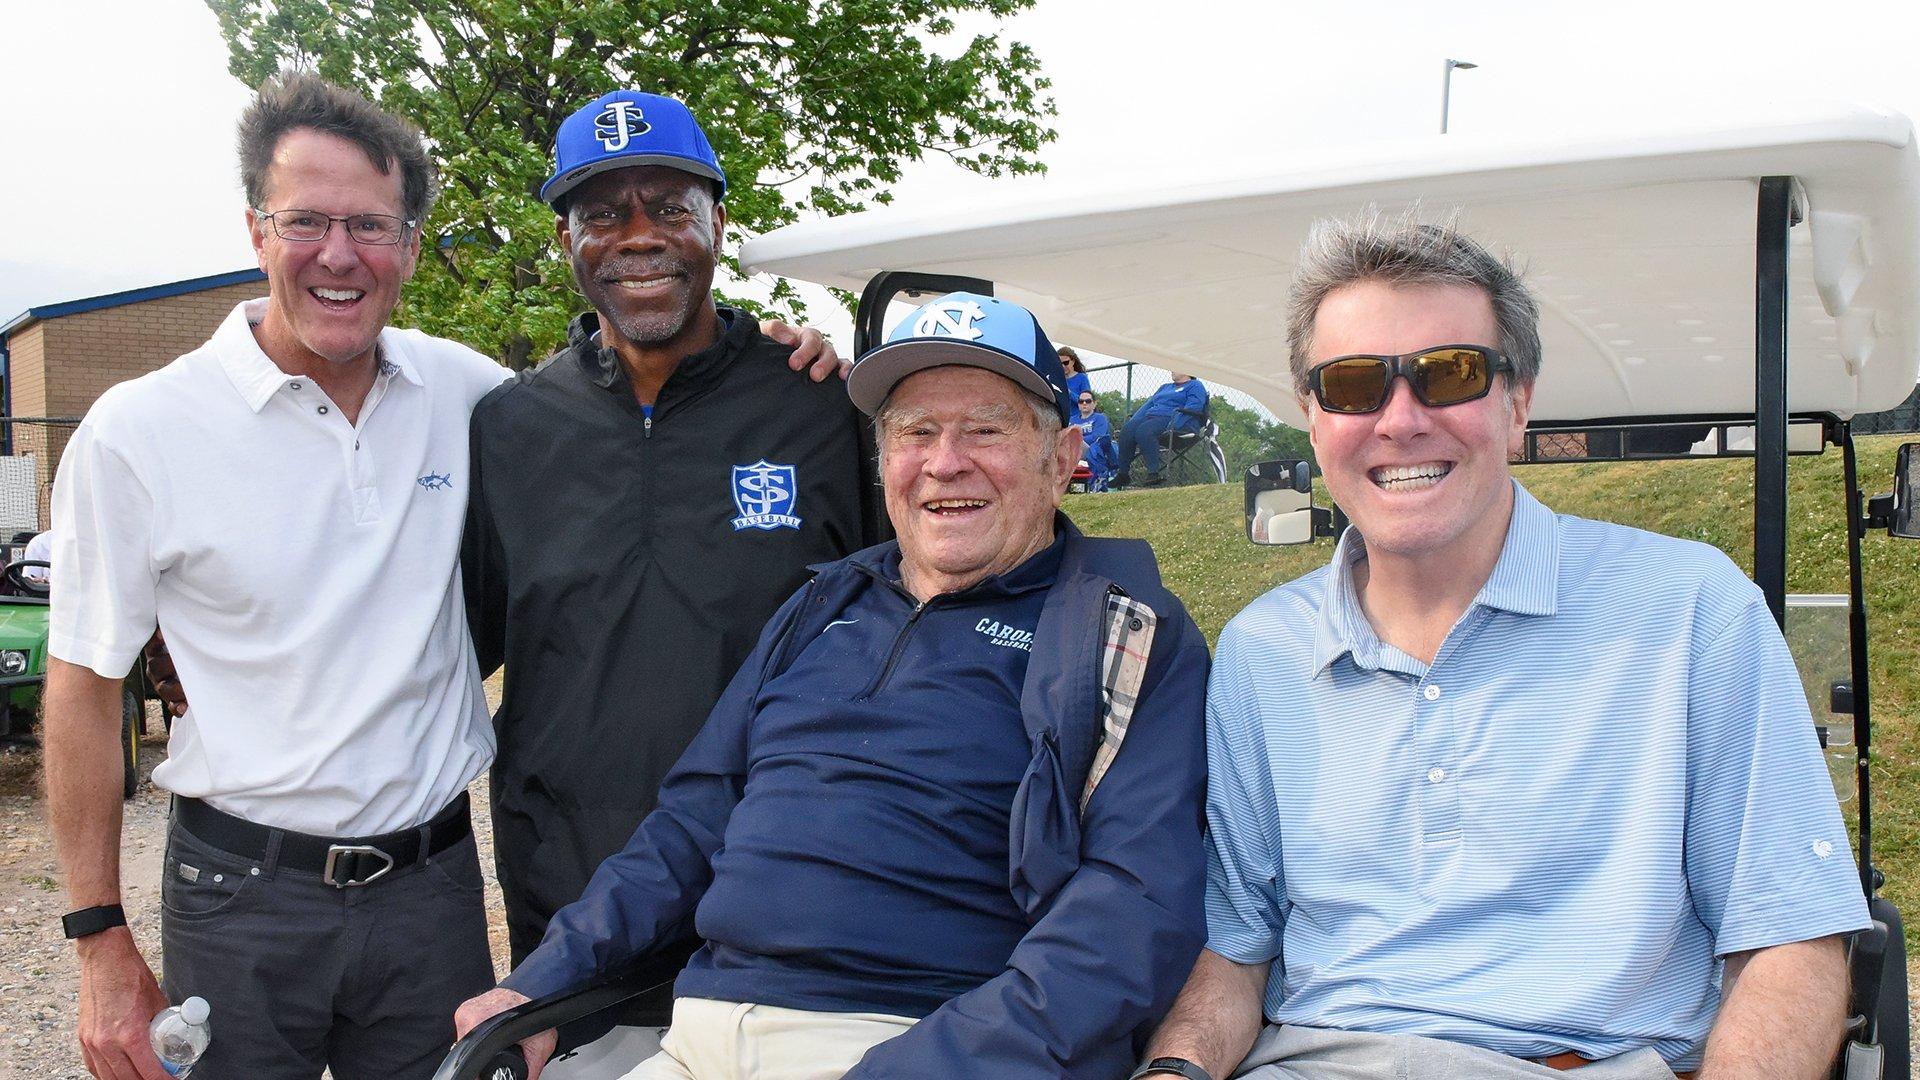 St. Joseph's Catholic School Names New Baseball Training Facility for Joe Pazdan Sr.